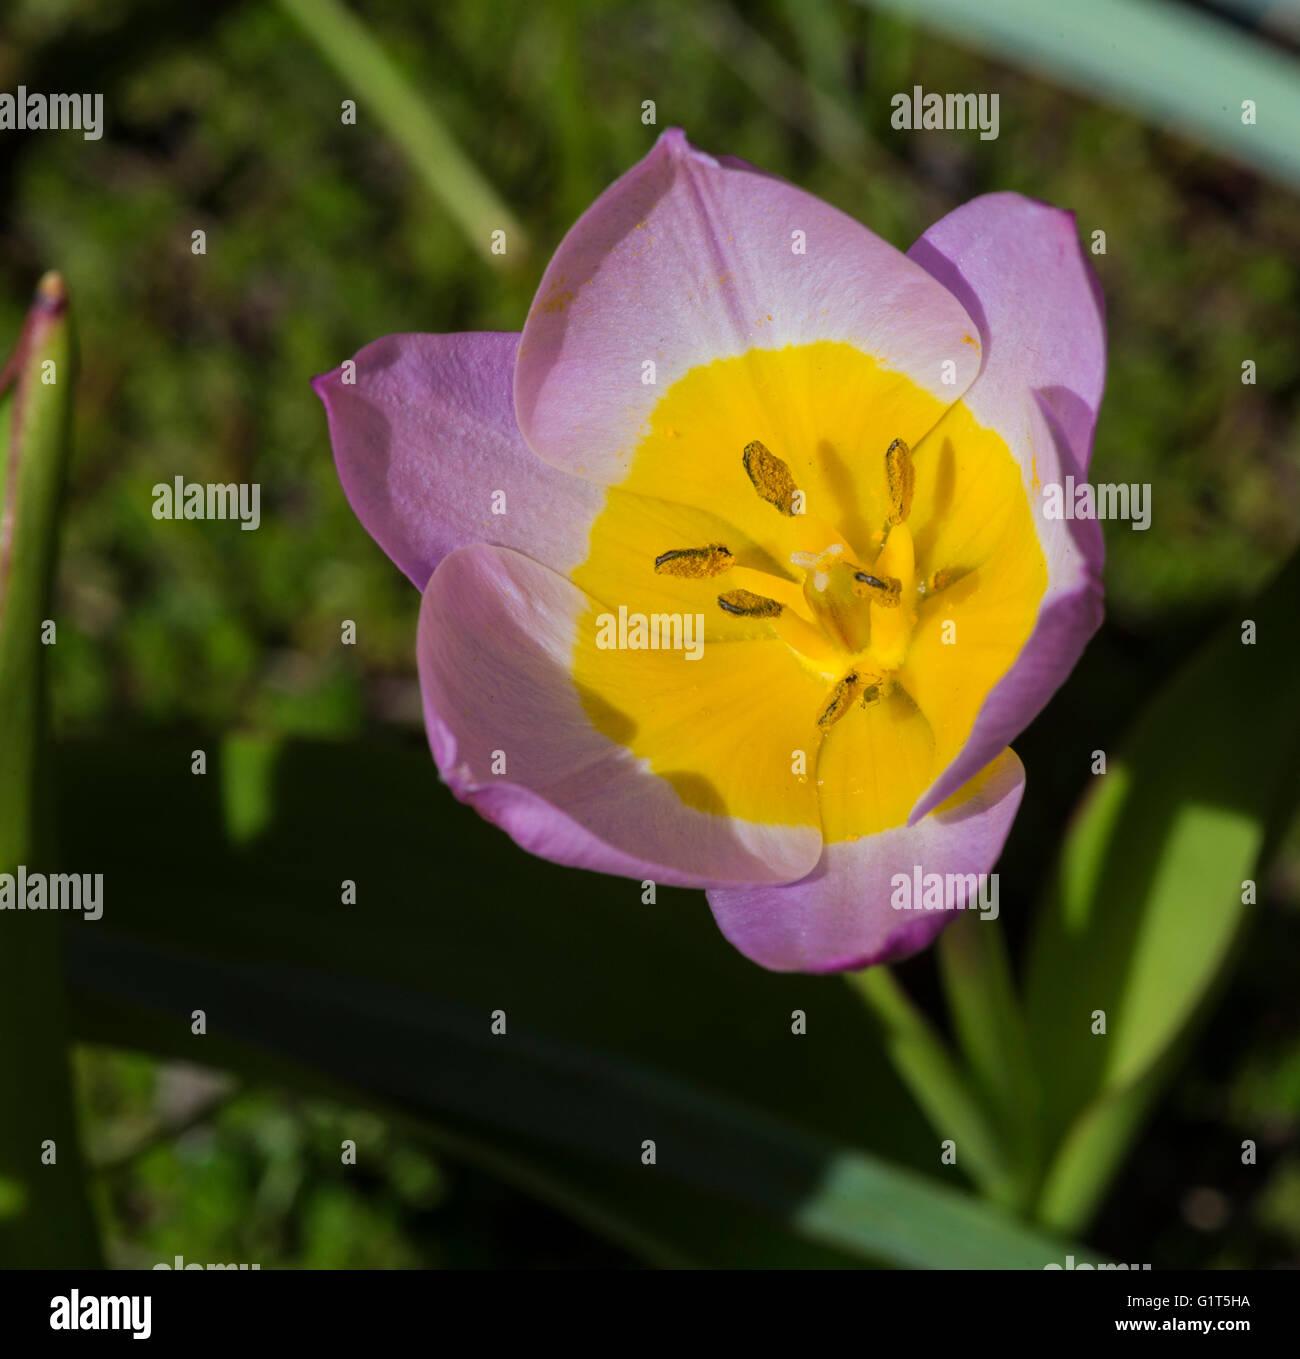 Kyrgystan mountain tulip close-up macro - Stock Image